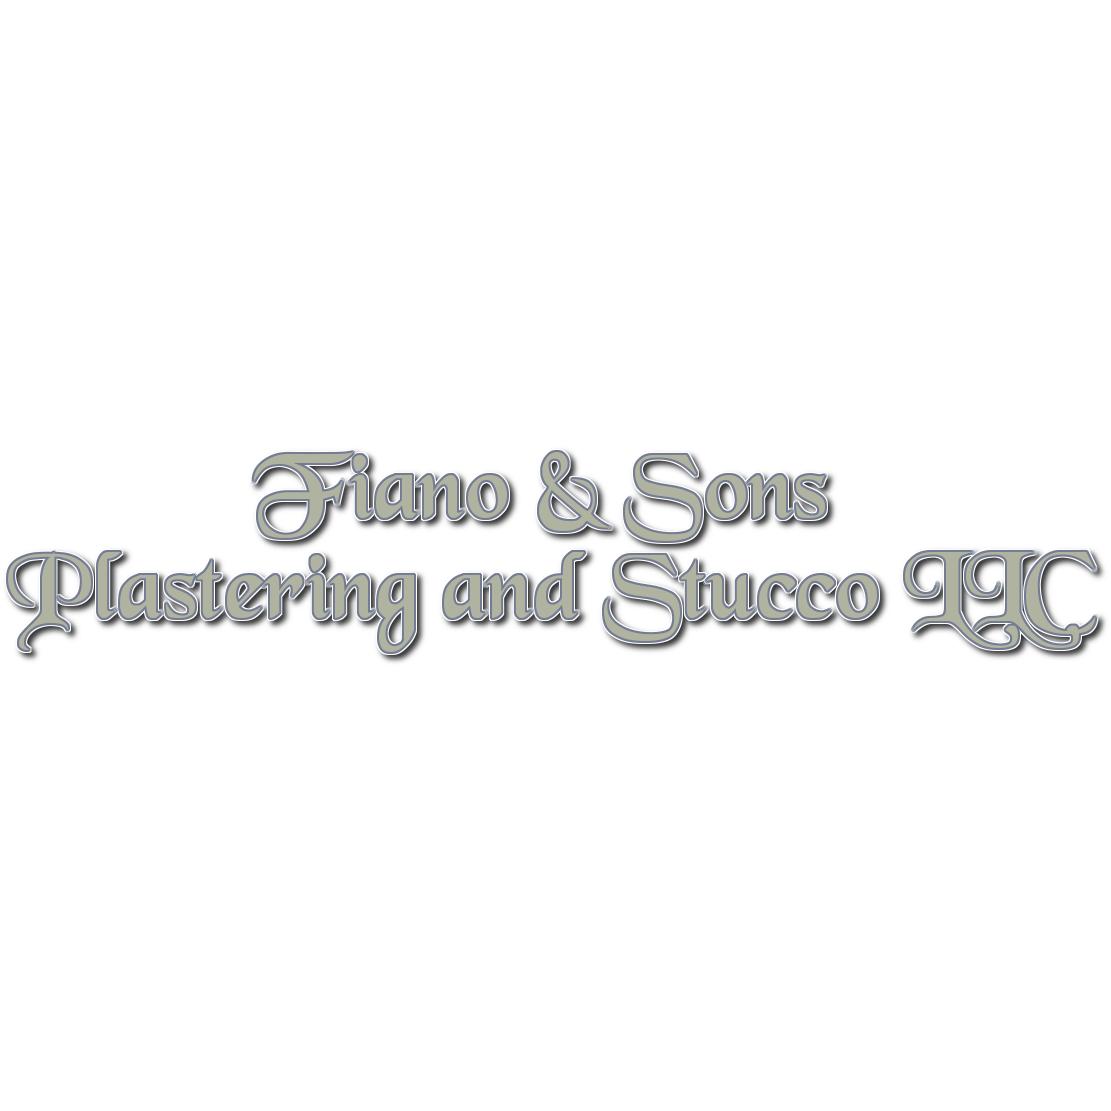 Fiano & Sons Plastering and Stucco LLC Logo